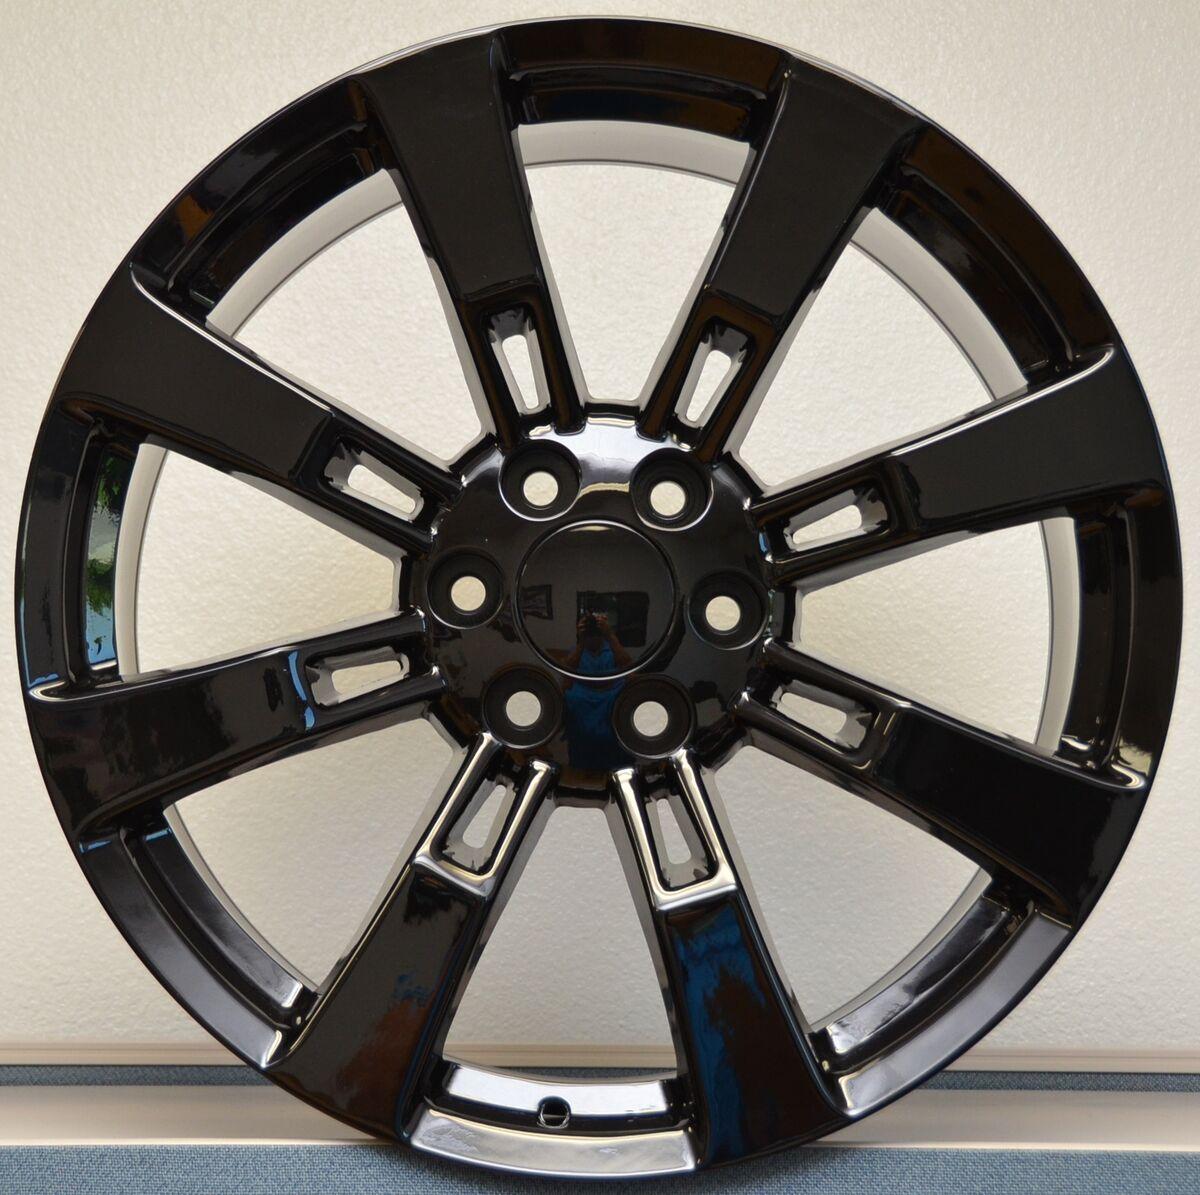 Denali Escalade Sierra Yukon Tahoe Wheels Rims Set Gloss Black